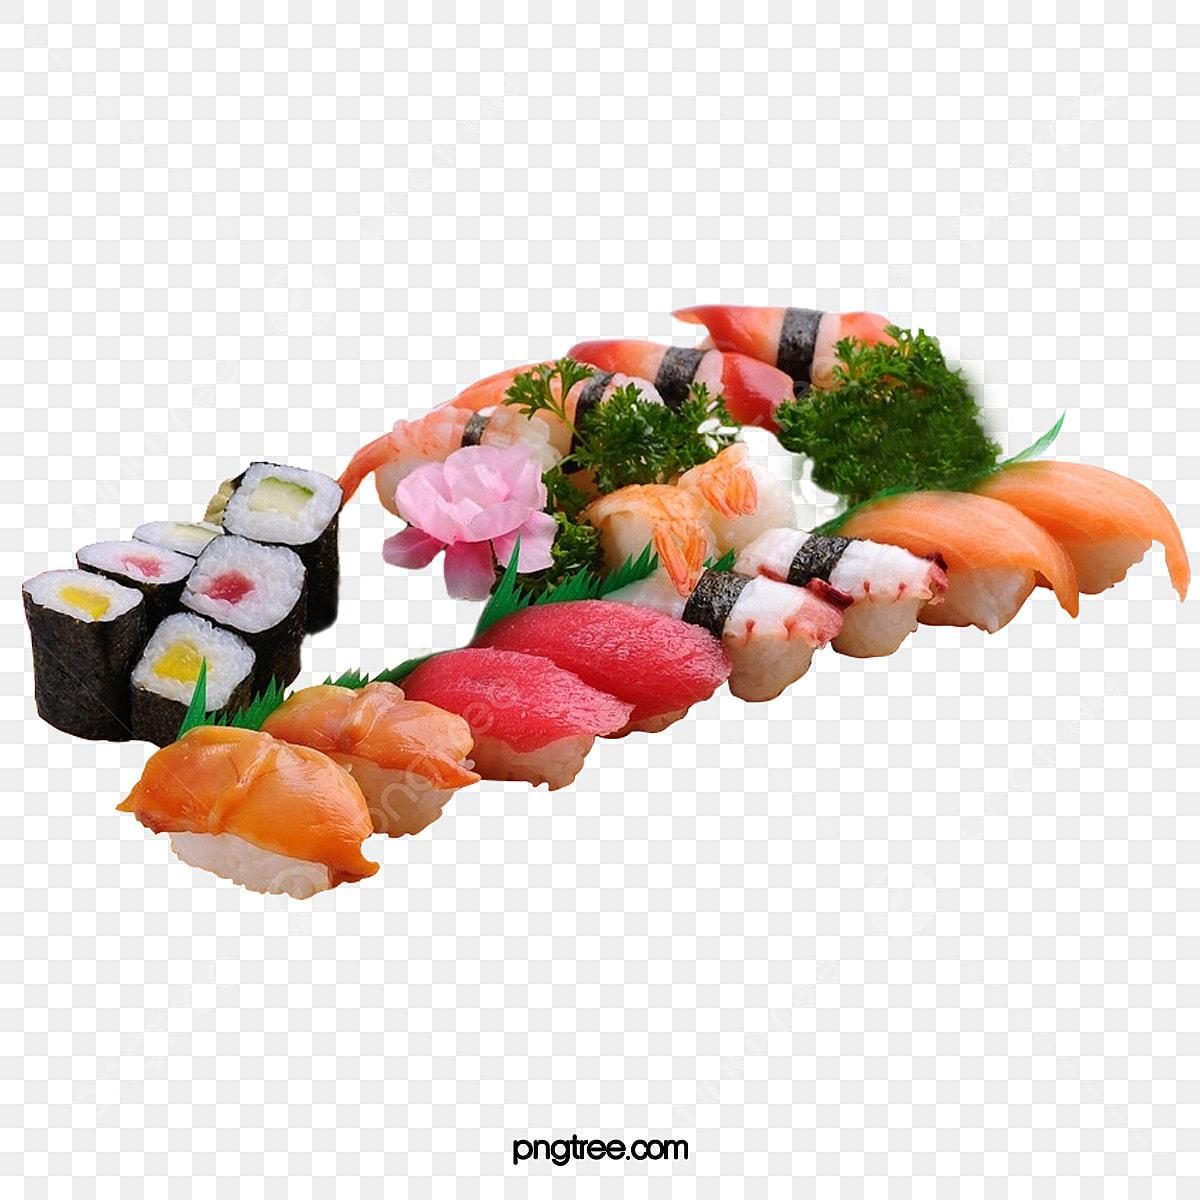 Sushi-japanische Küche Makizushi Meeresfrüchten Clip-art - Sushi  Transparente PNG png herunterladen - 600*432 - Kostenlos transparent Küche  png Herunterladen.